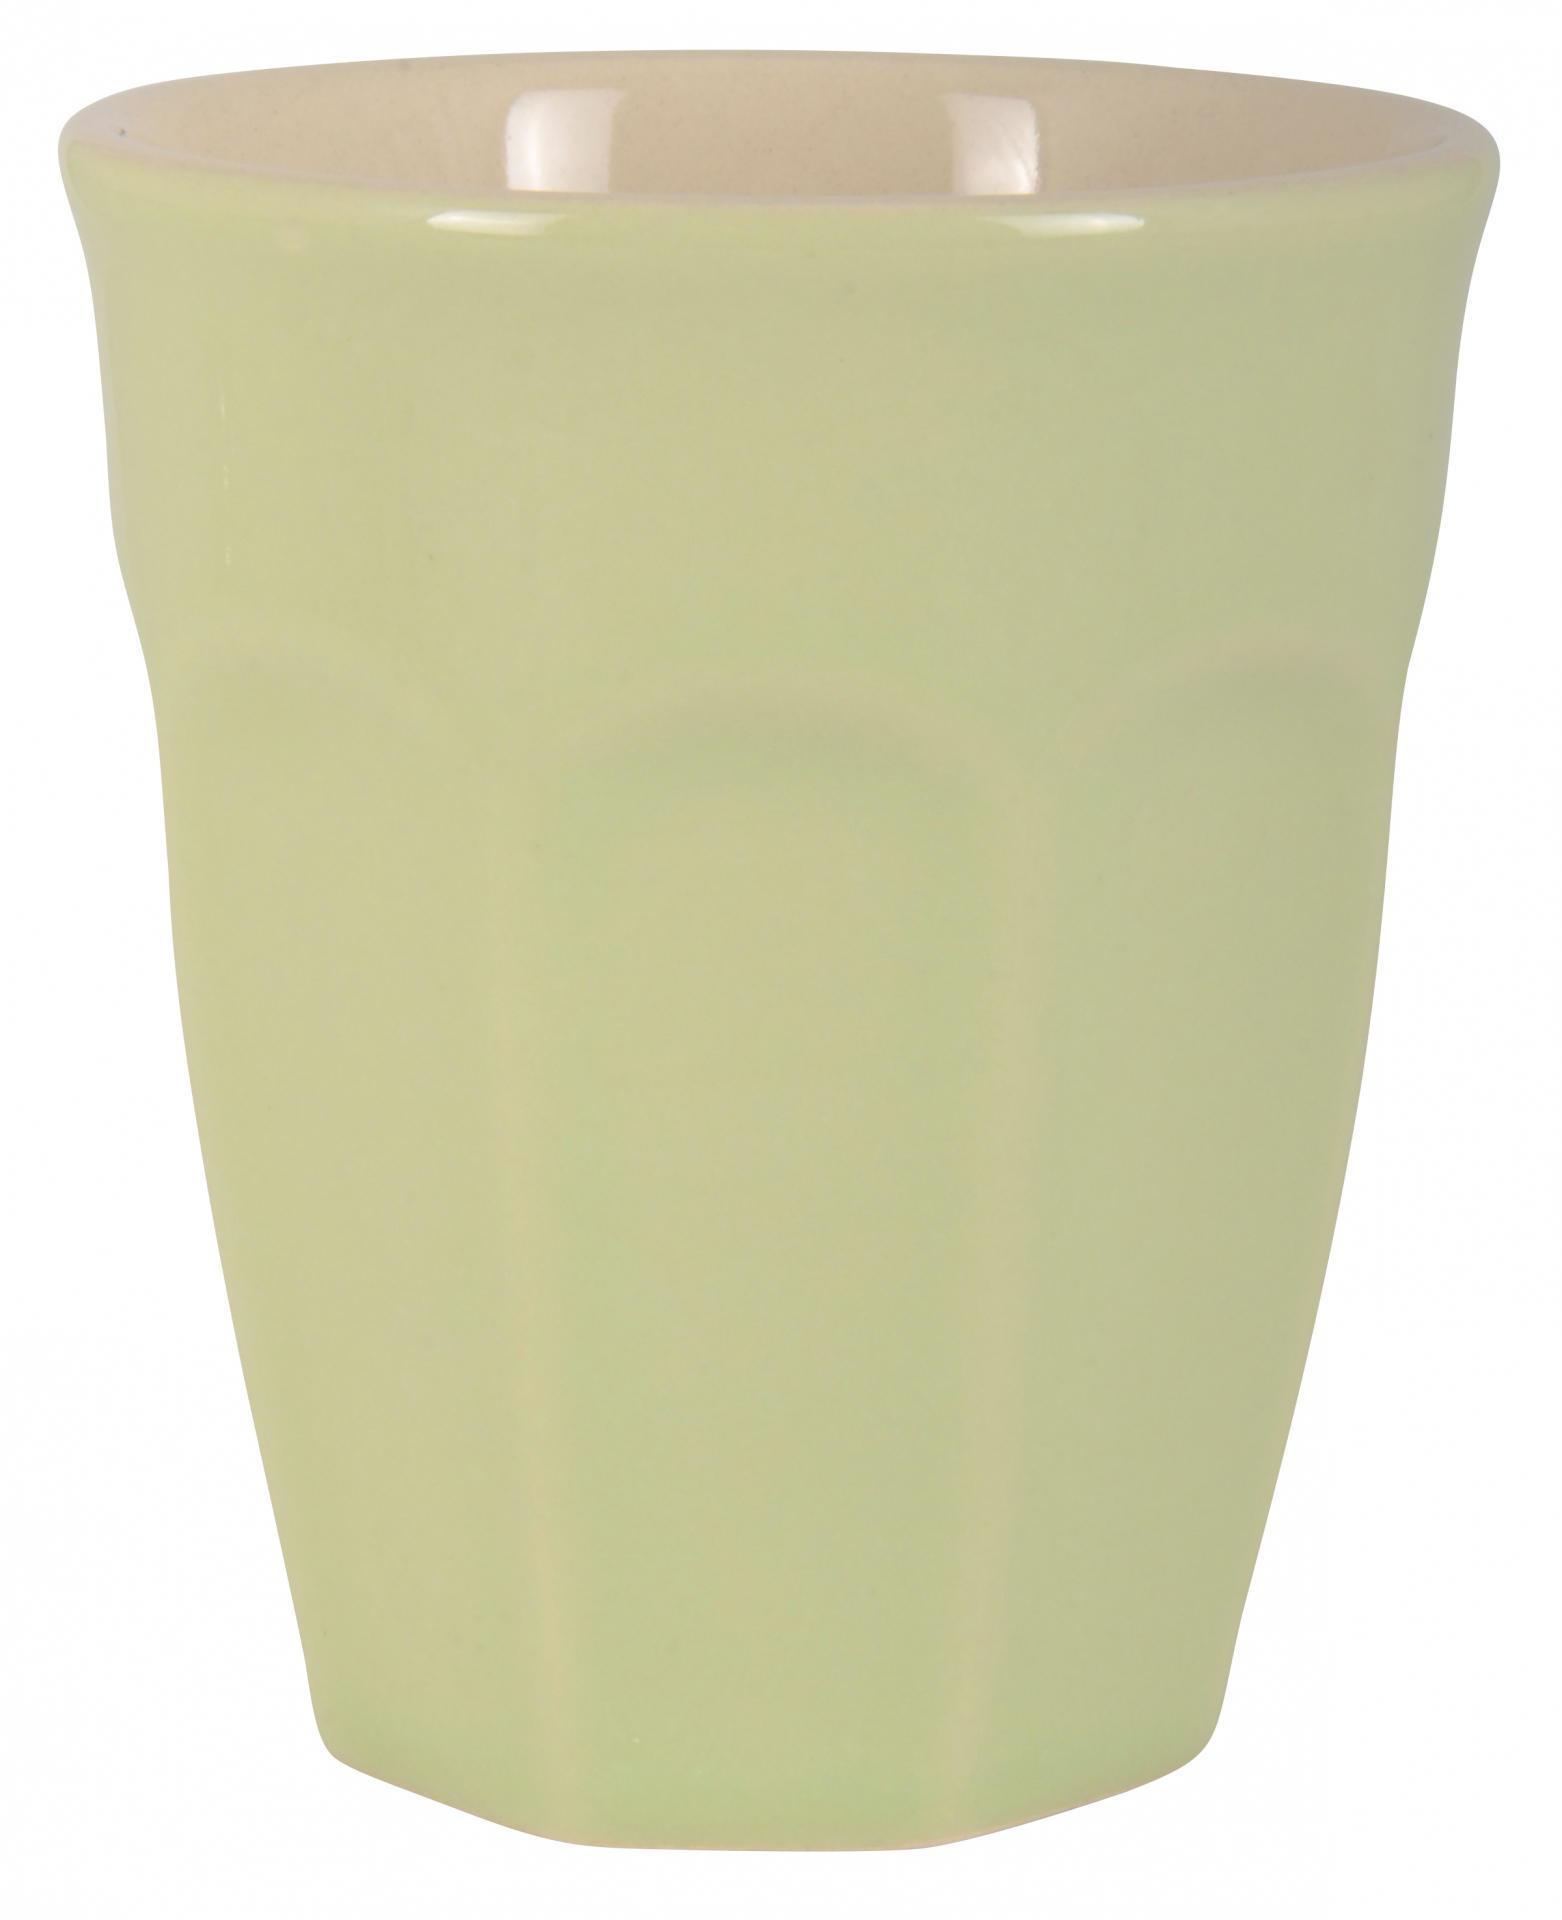 IB LAURSEN Latte hrneček Mynte applegreen 250 ml, zelená barva, keramika